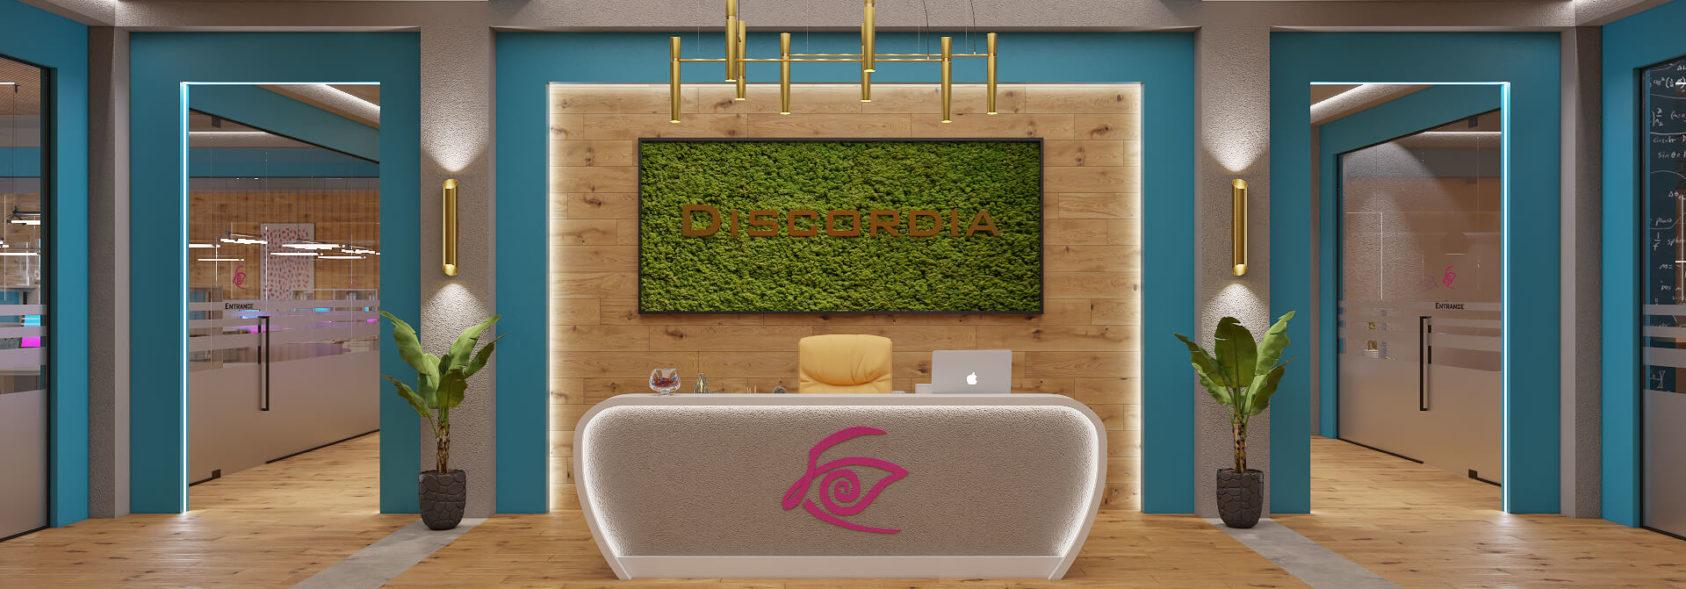 Дизайн офиса Киев